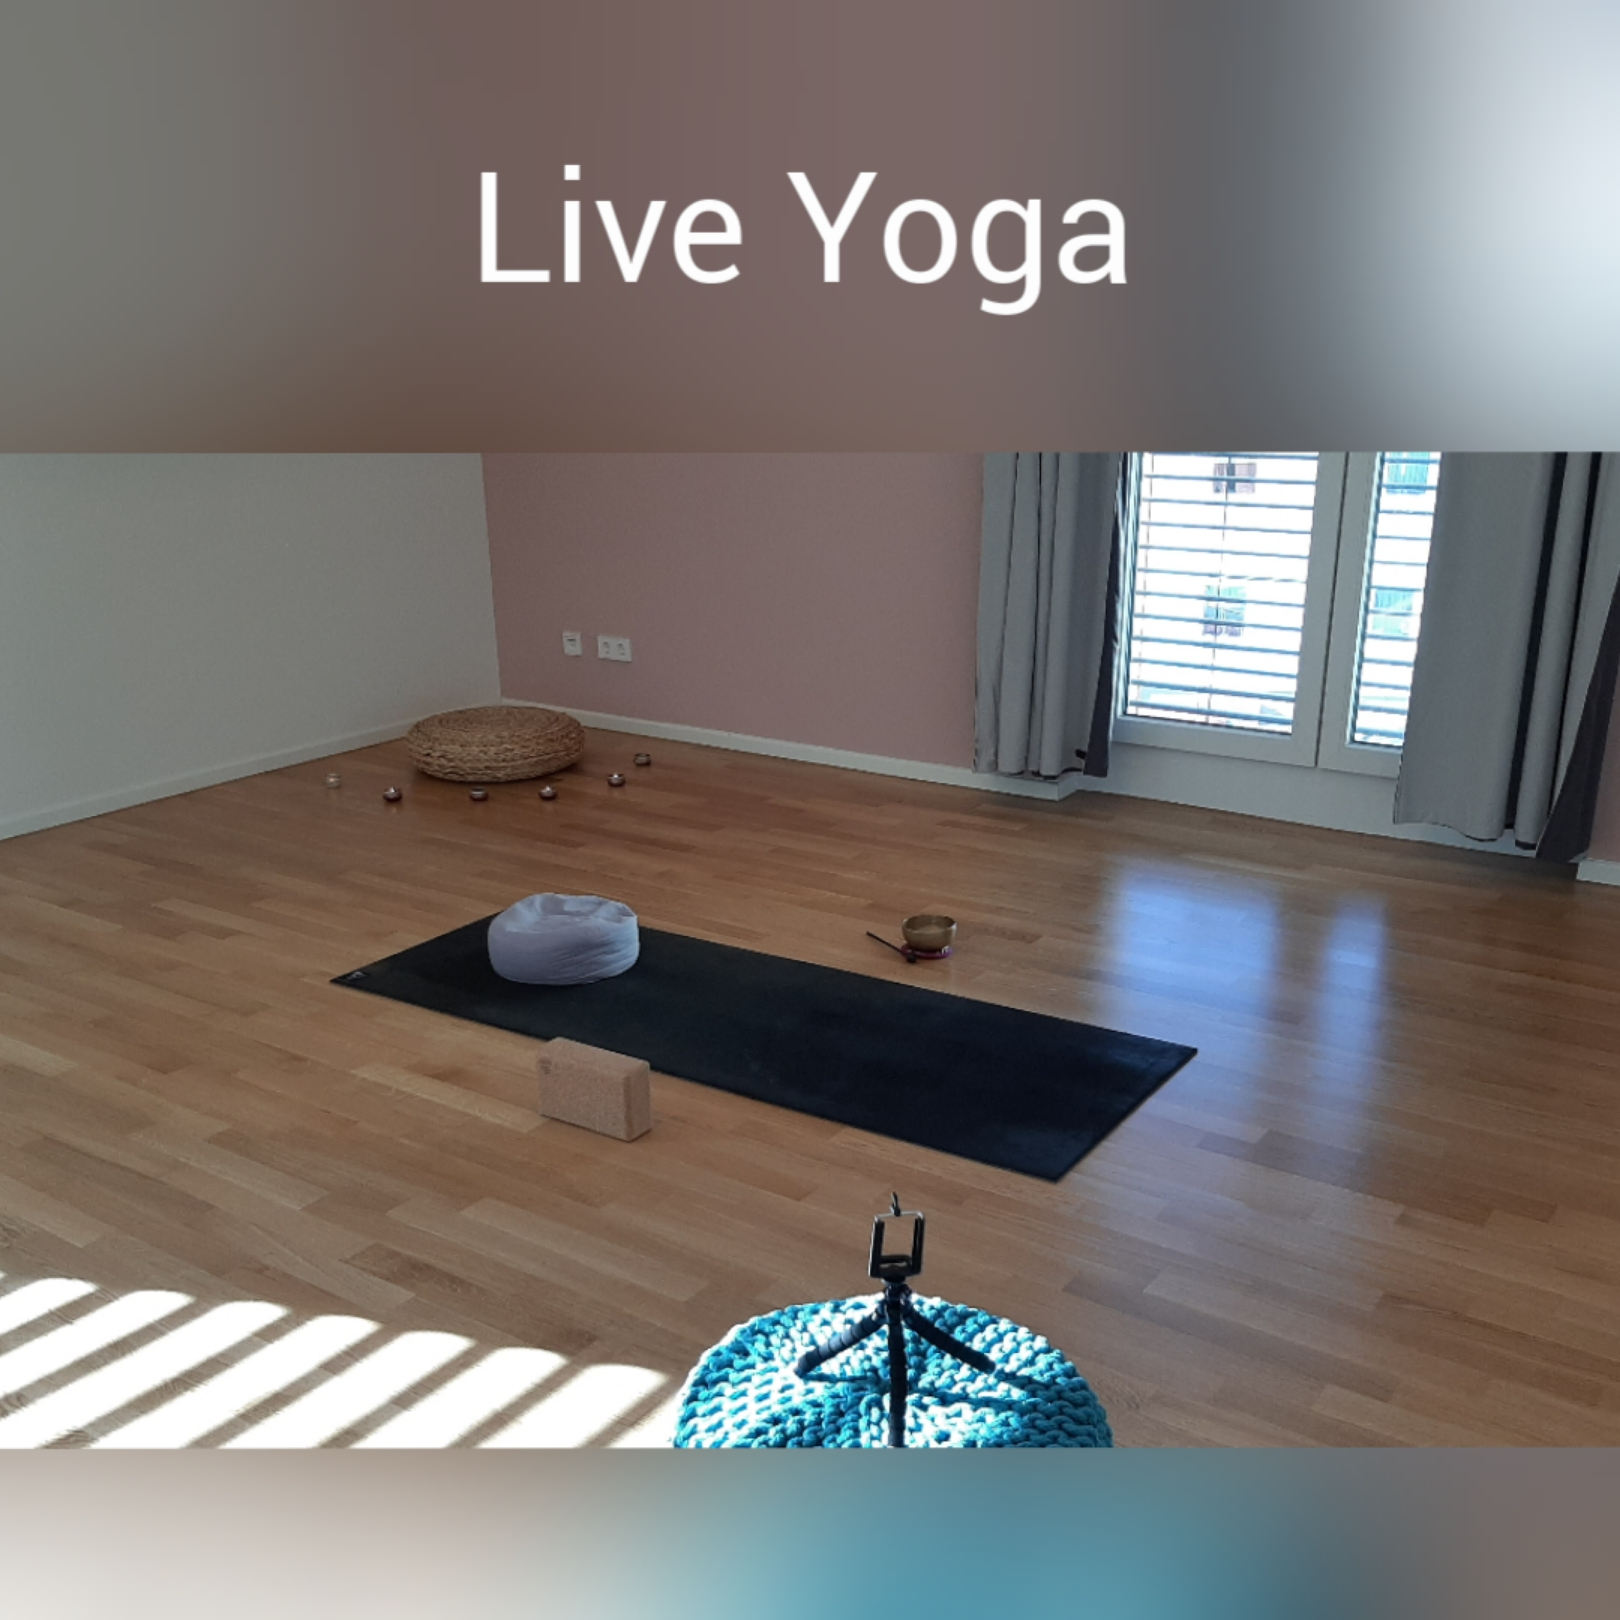 Yogalounge Nicole Veith Walzbachtal | Yoga-Specials | Yogakurse im Live-Stream